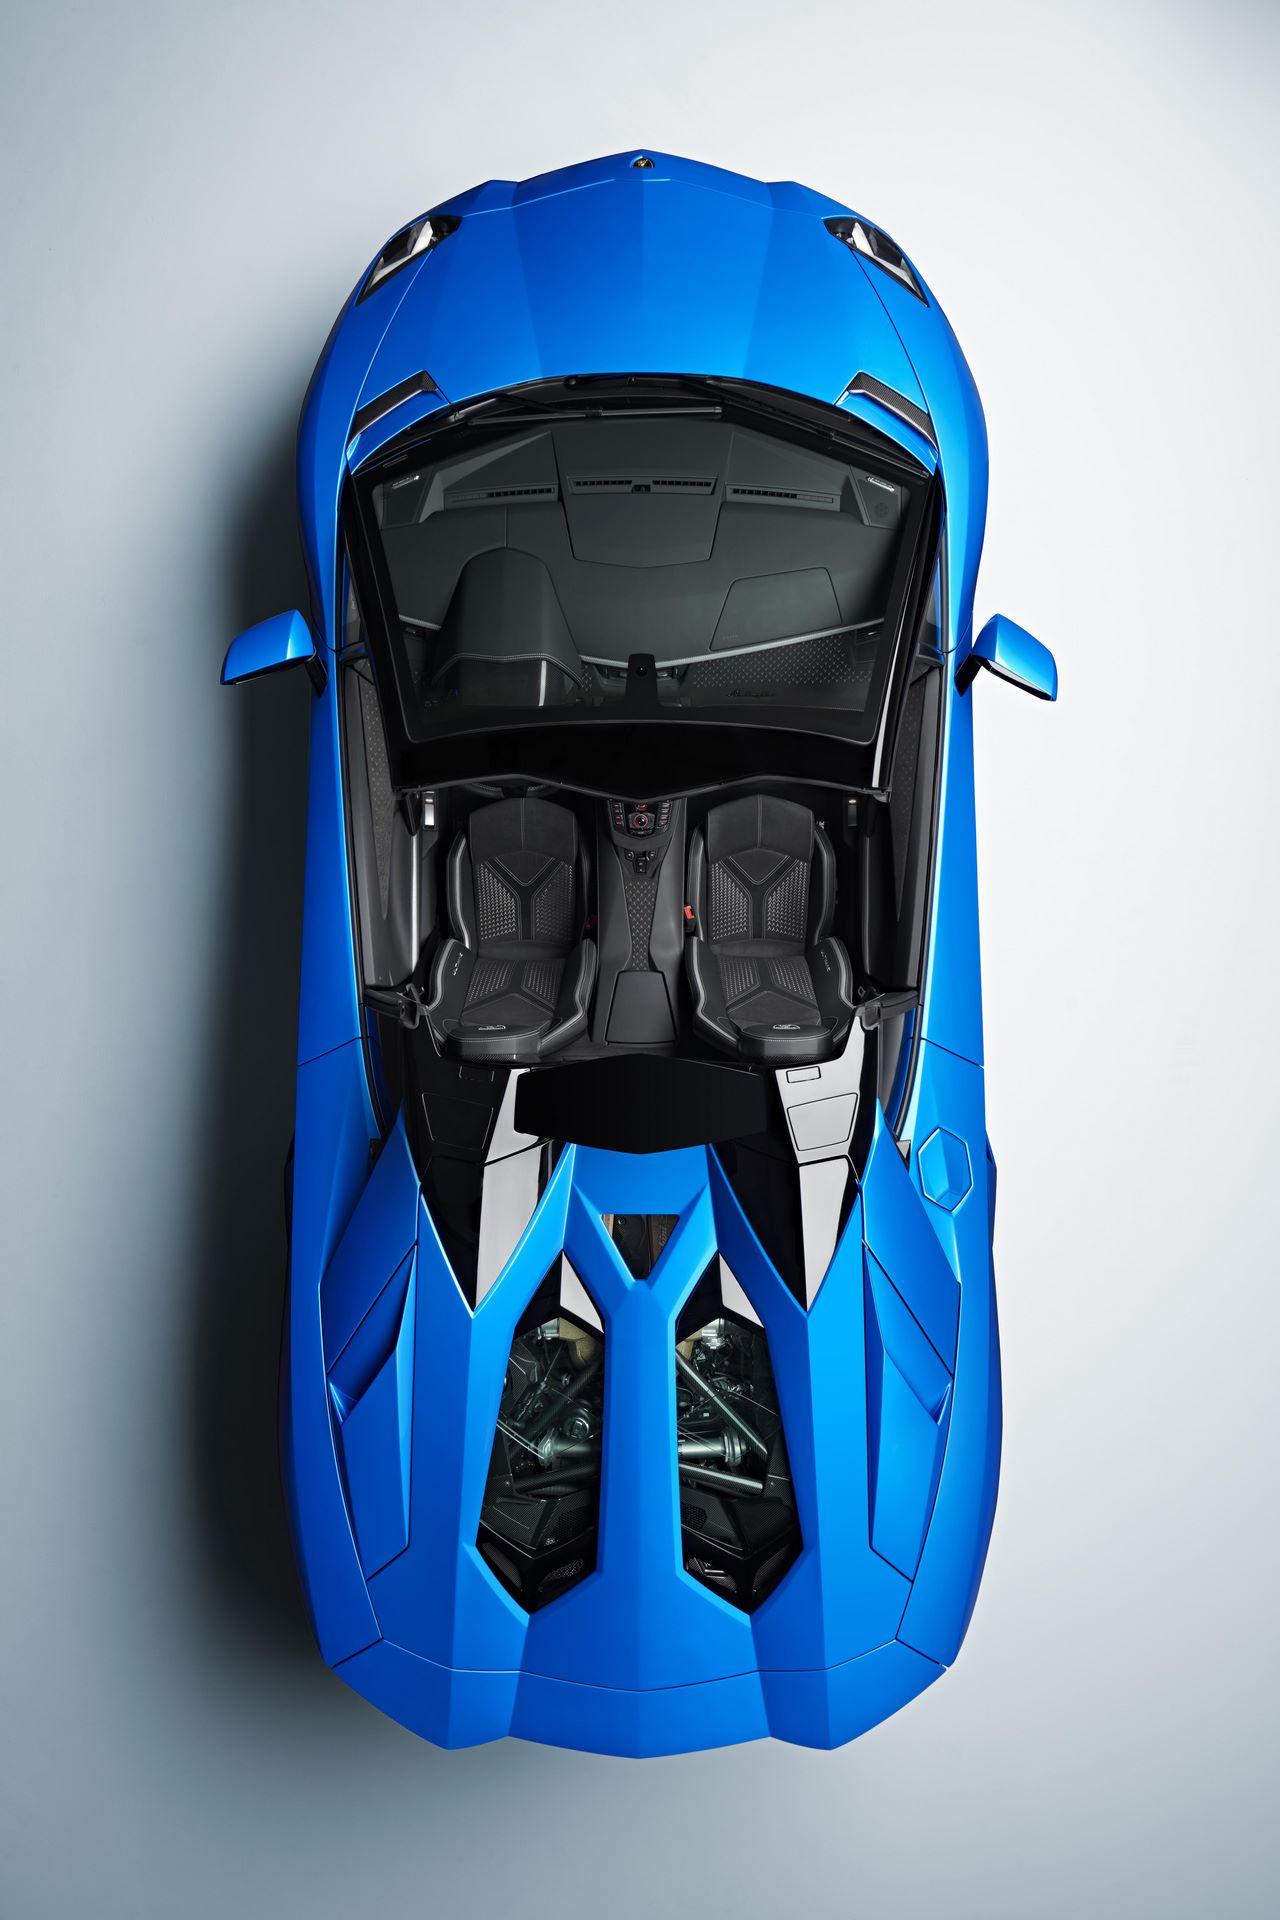 Lamborghini-Aventador-LP780-4-Ultimae-36